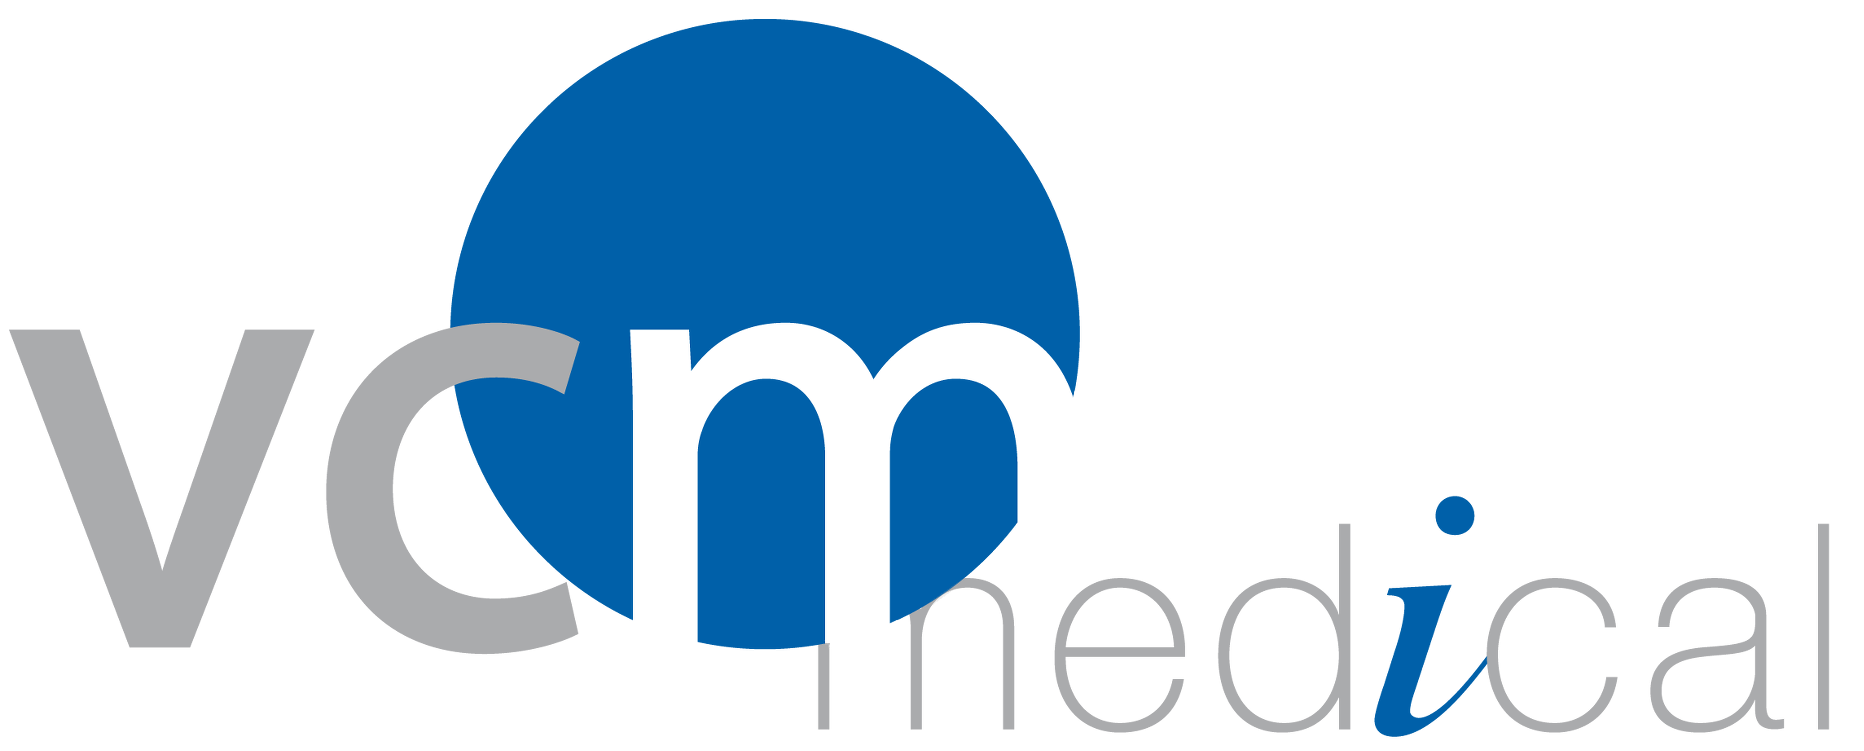 VCM Medical